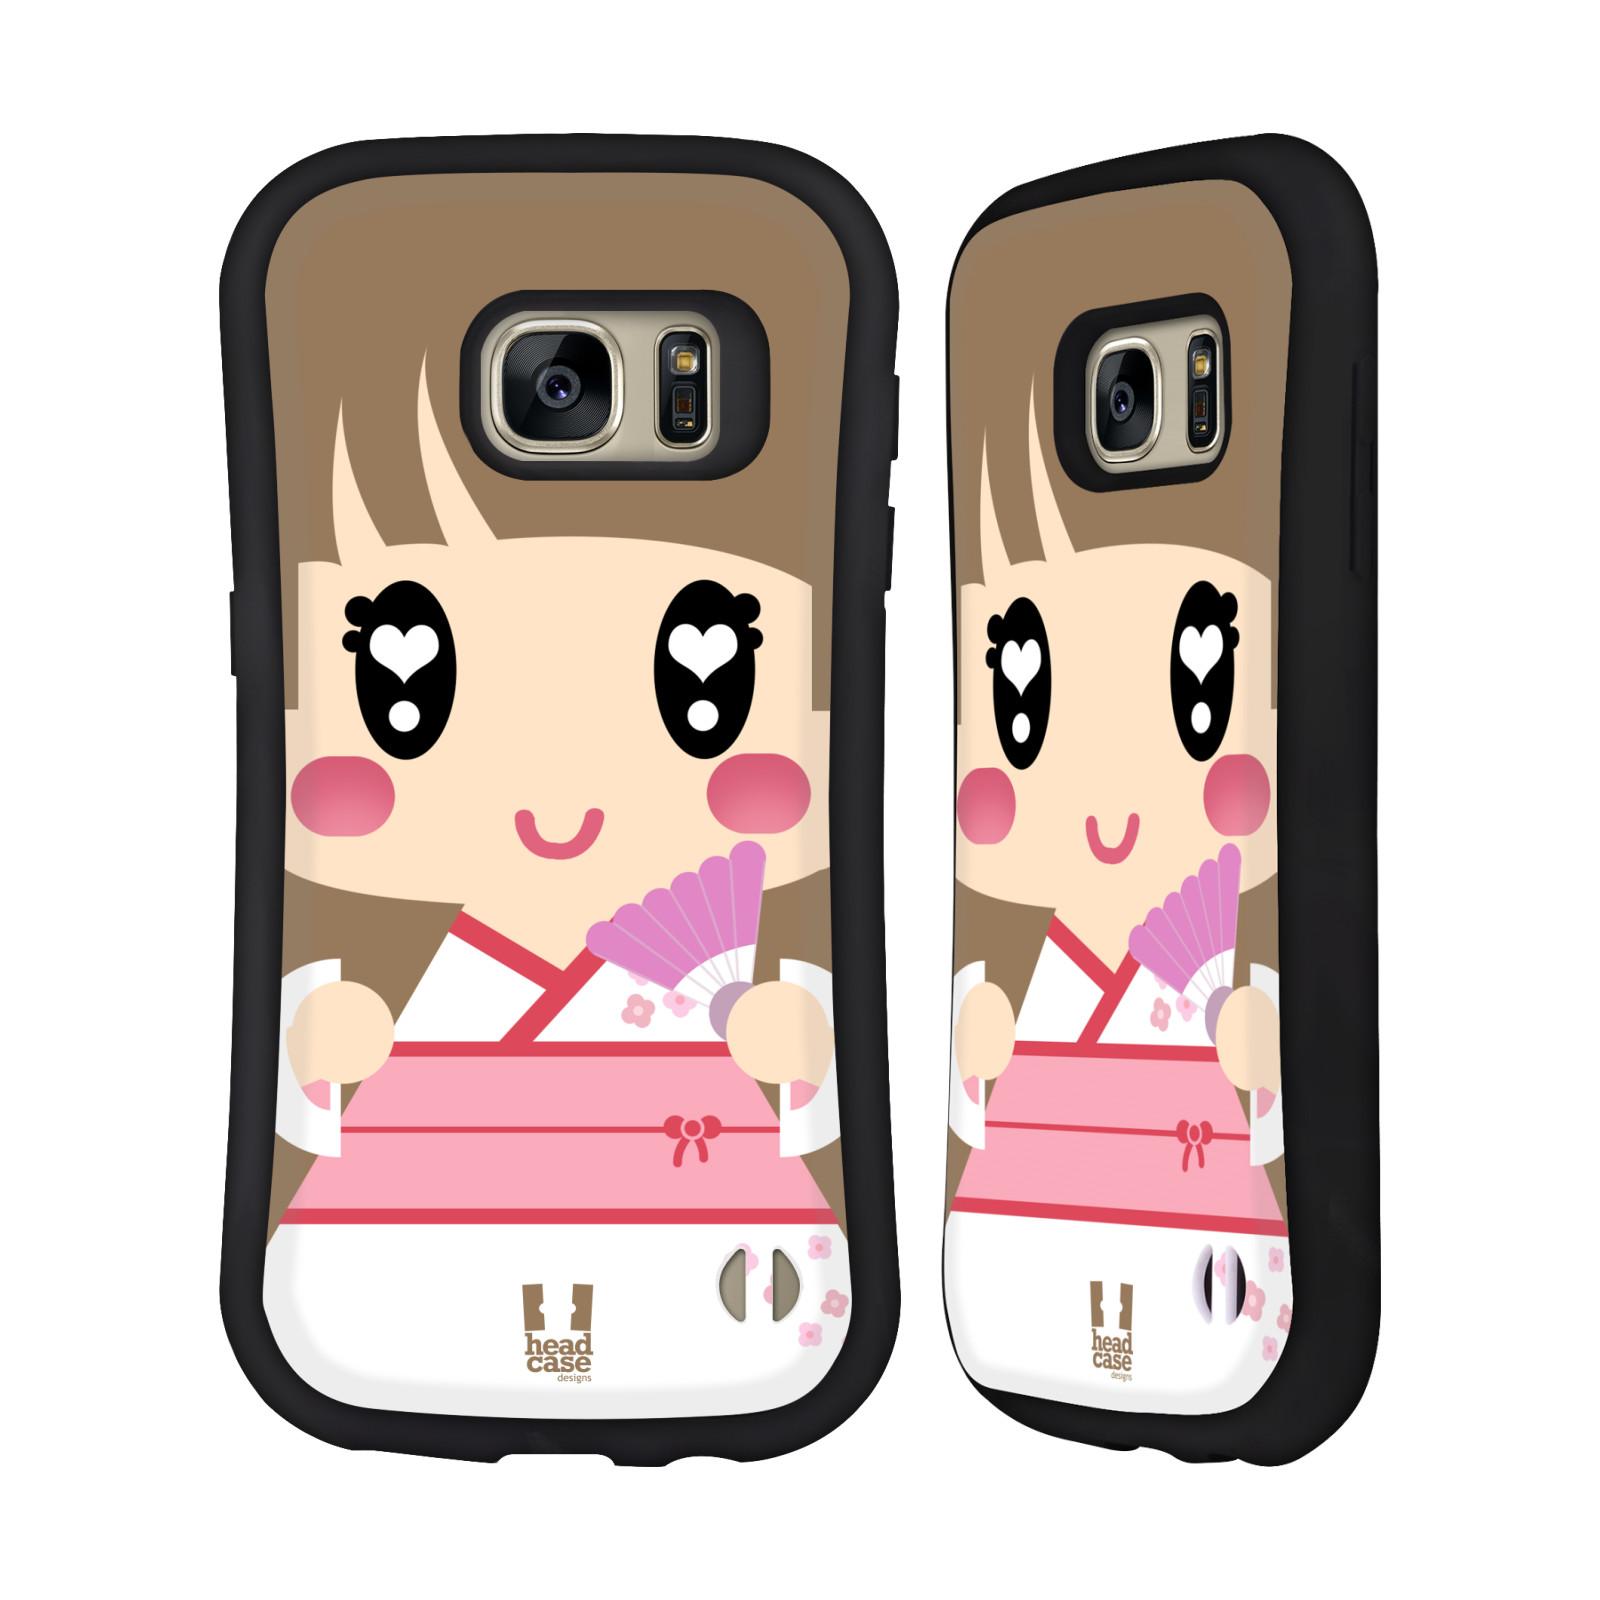 HEAD CASE DESIGNS KAWAII SERIES 1 HYBRID CASE FOR SAMSUNG PHONES